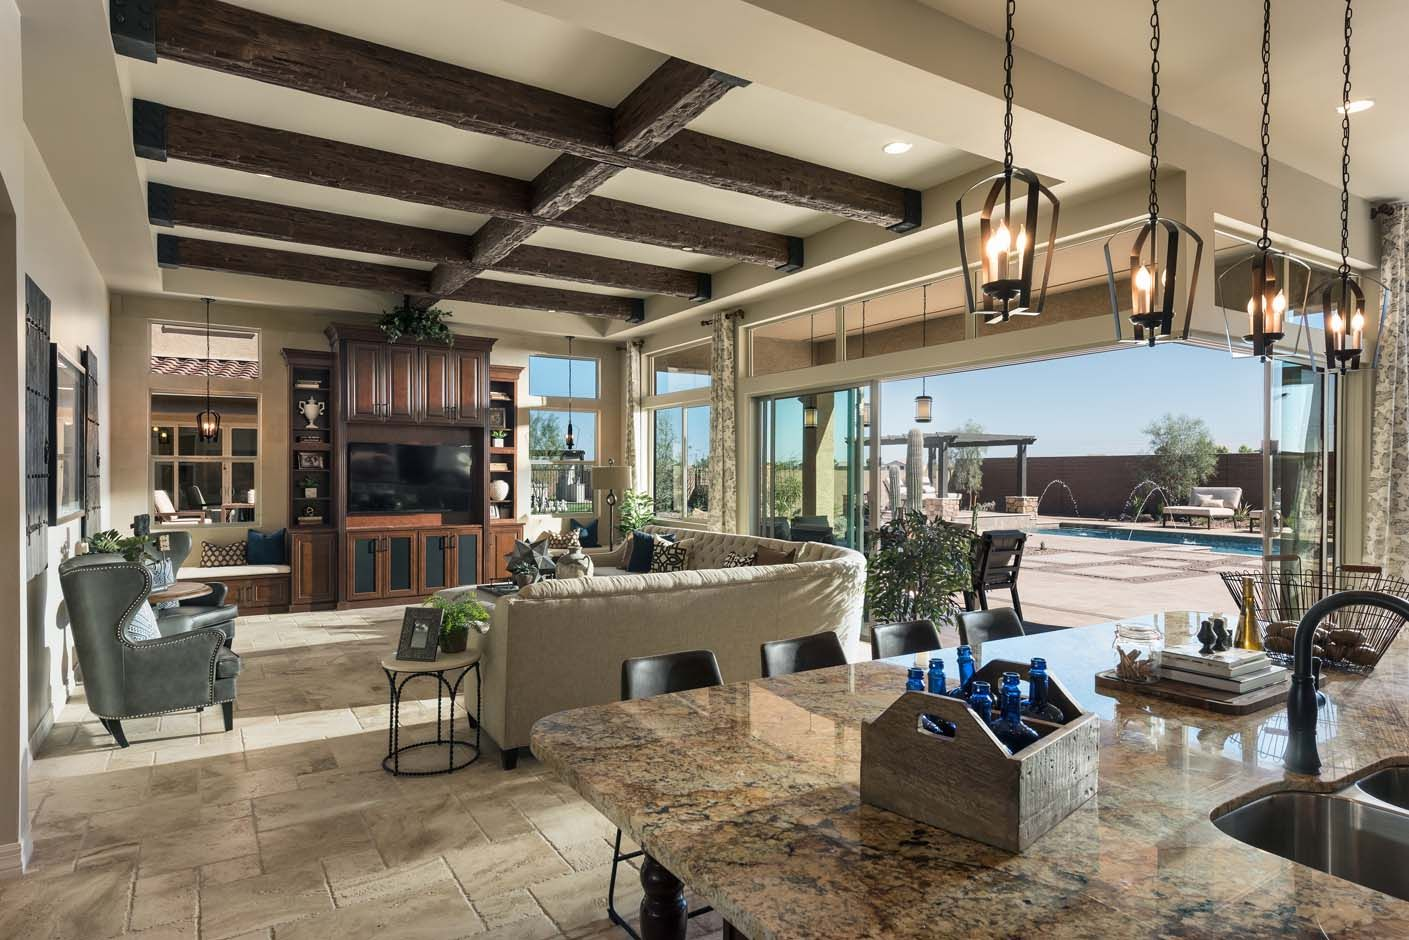 Single Family for Active at Palo Verde 9307 W. Villa Hermosa Ln. Peoria, Arizona 85383 United States